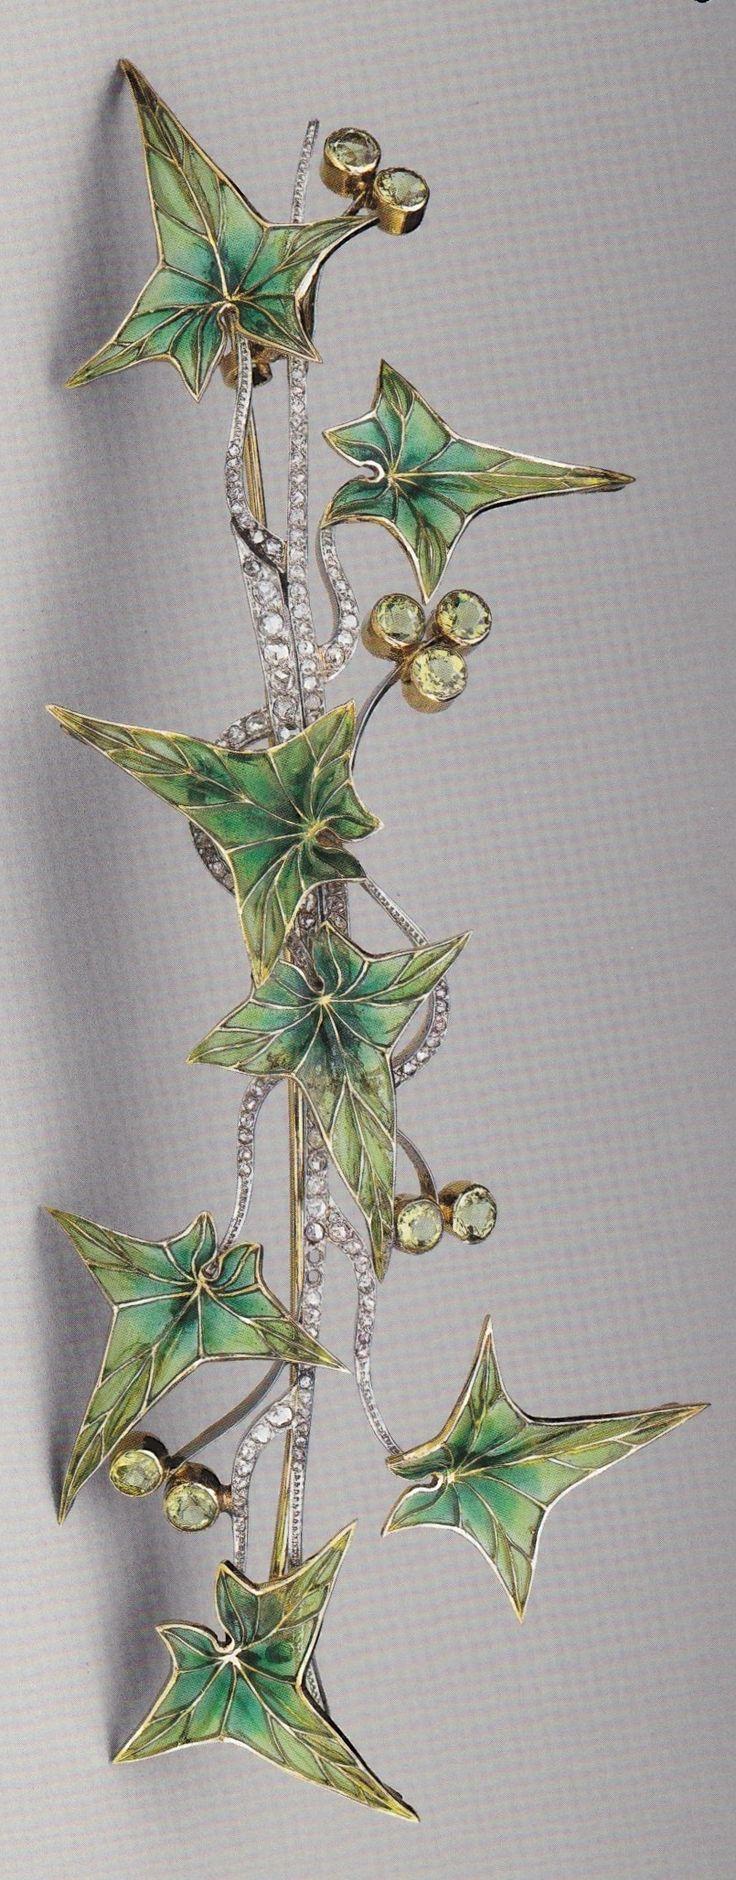 Platinum, gold, enamel, diamond and peridot 'Ivy' brooch, by an unknown maker, possibly Austrian, circa 1900. #ArtNouveau